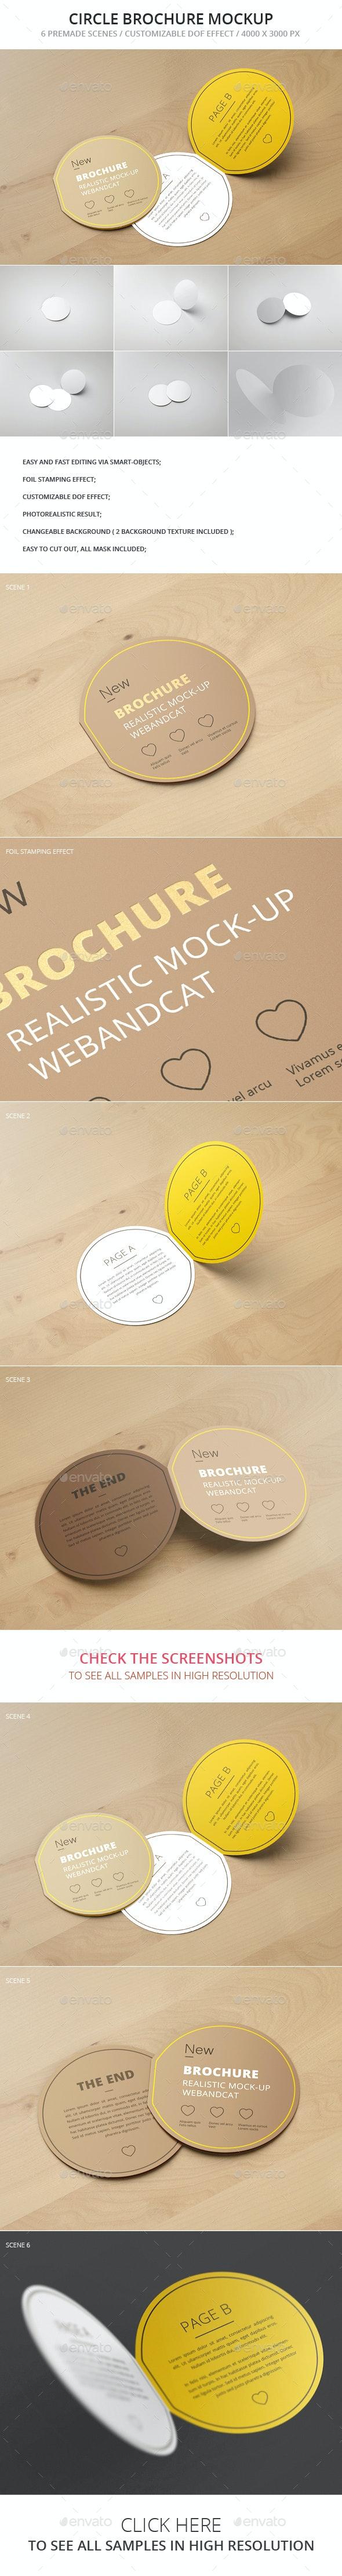 Circle Bi-Fold Brochure Mockup - Brochures Print